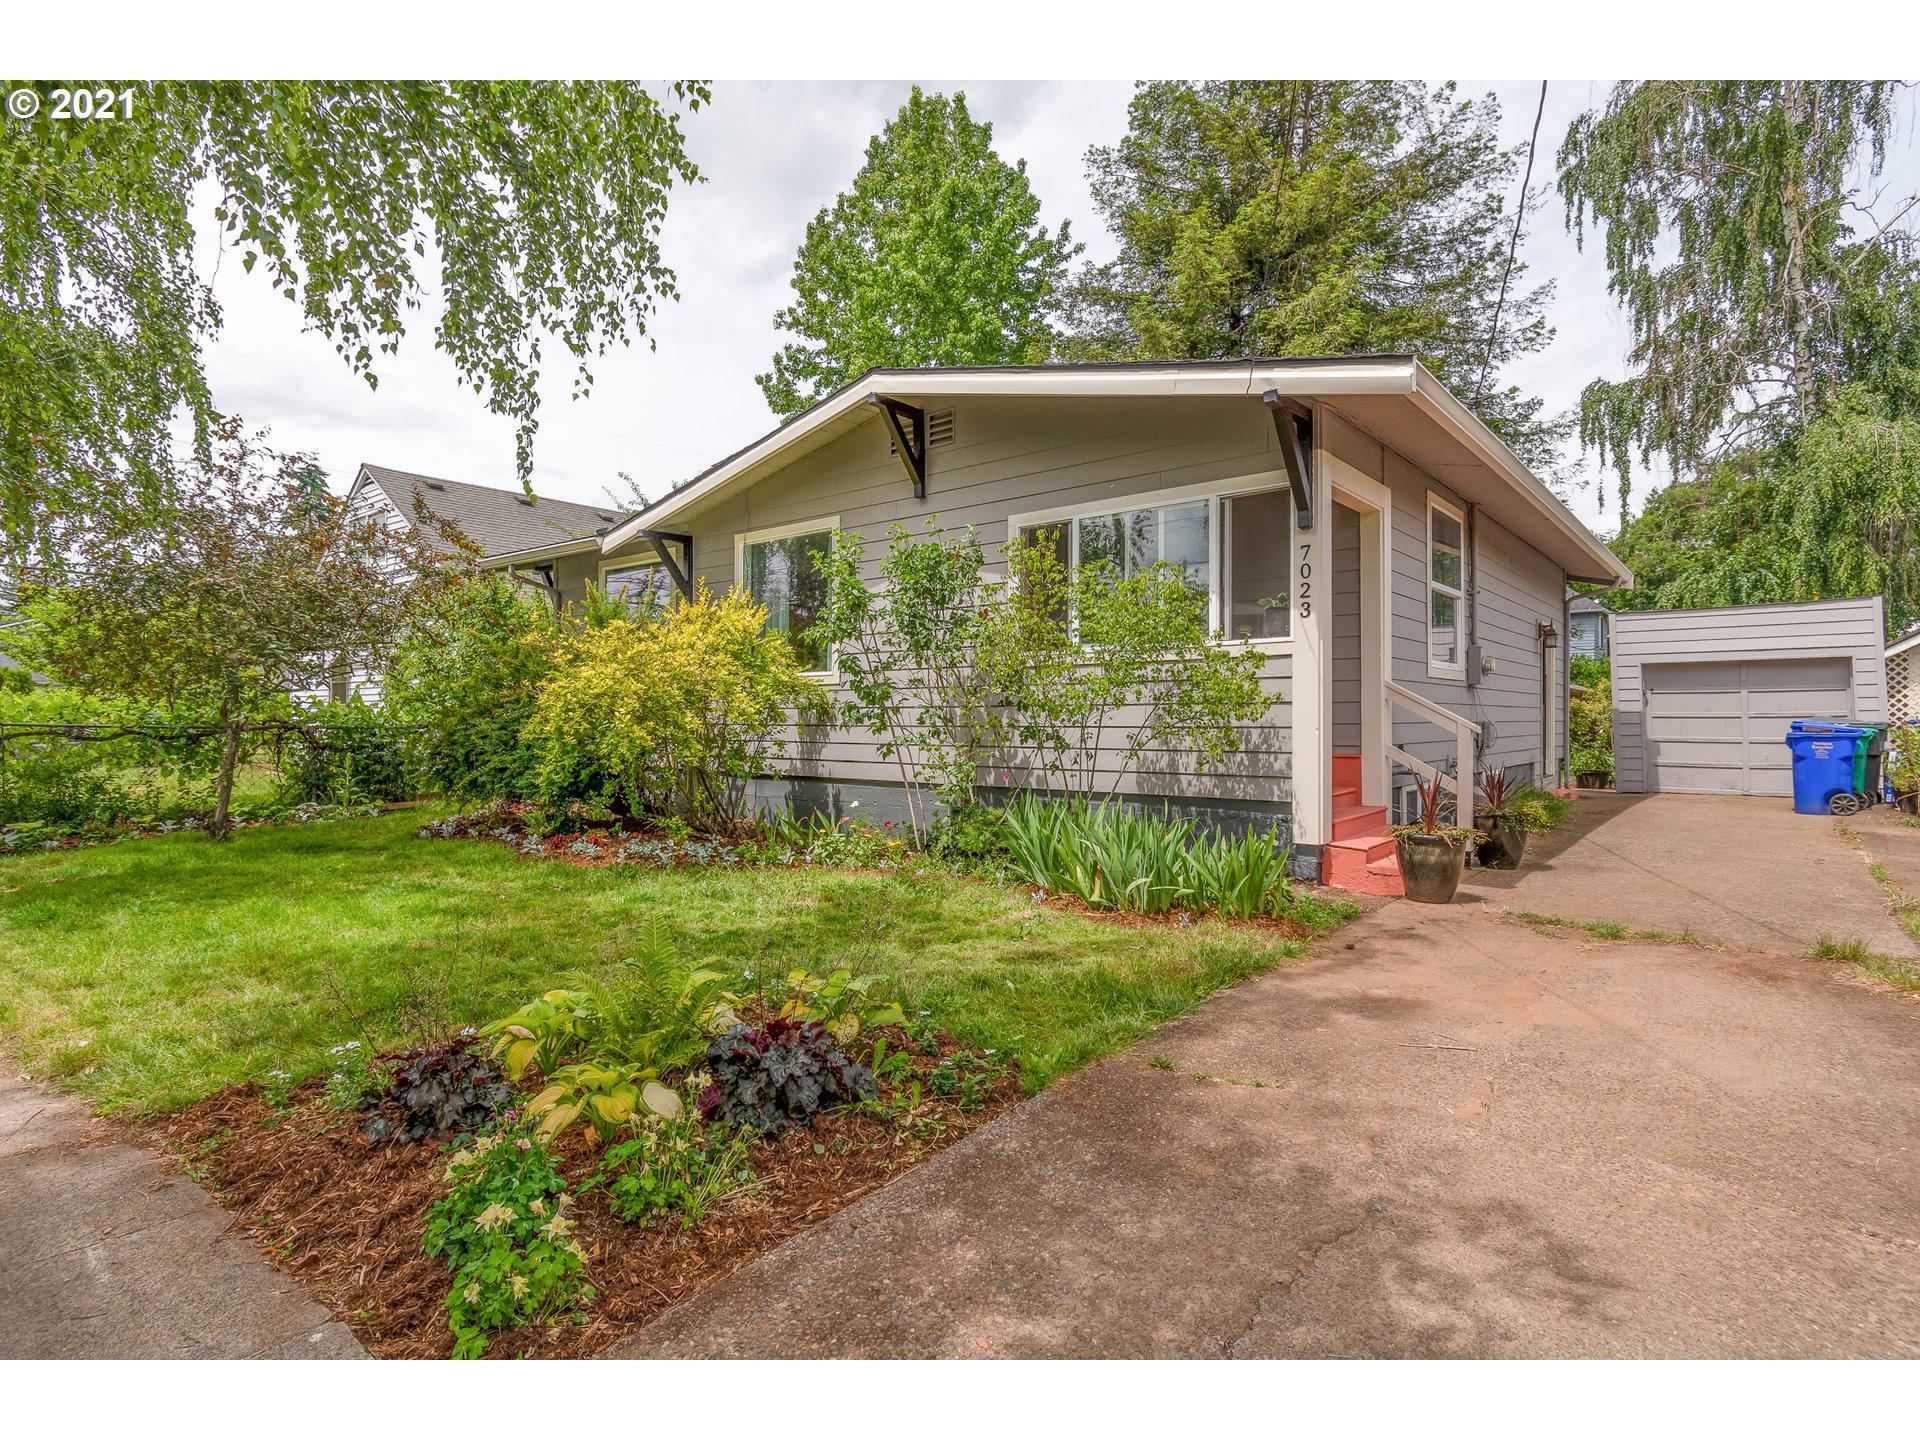 7023 N JERSEY ST, Portland OR 97203